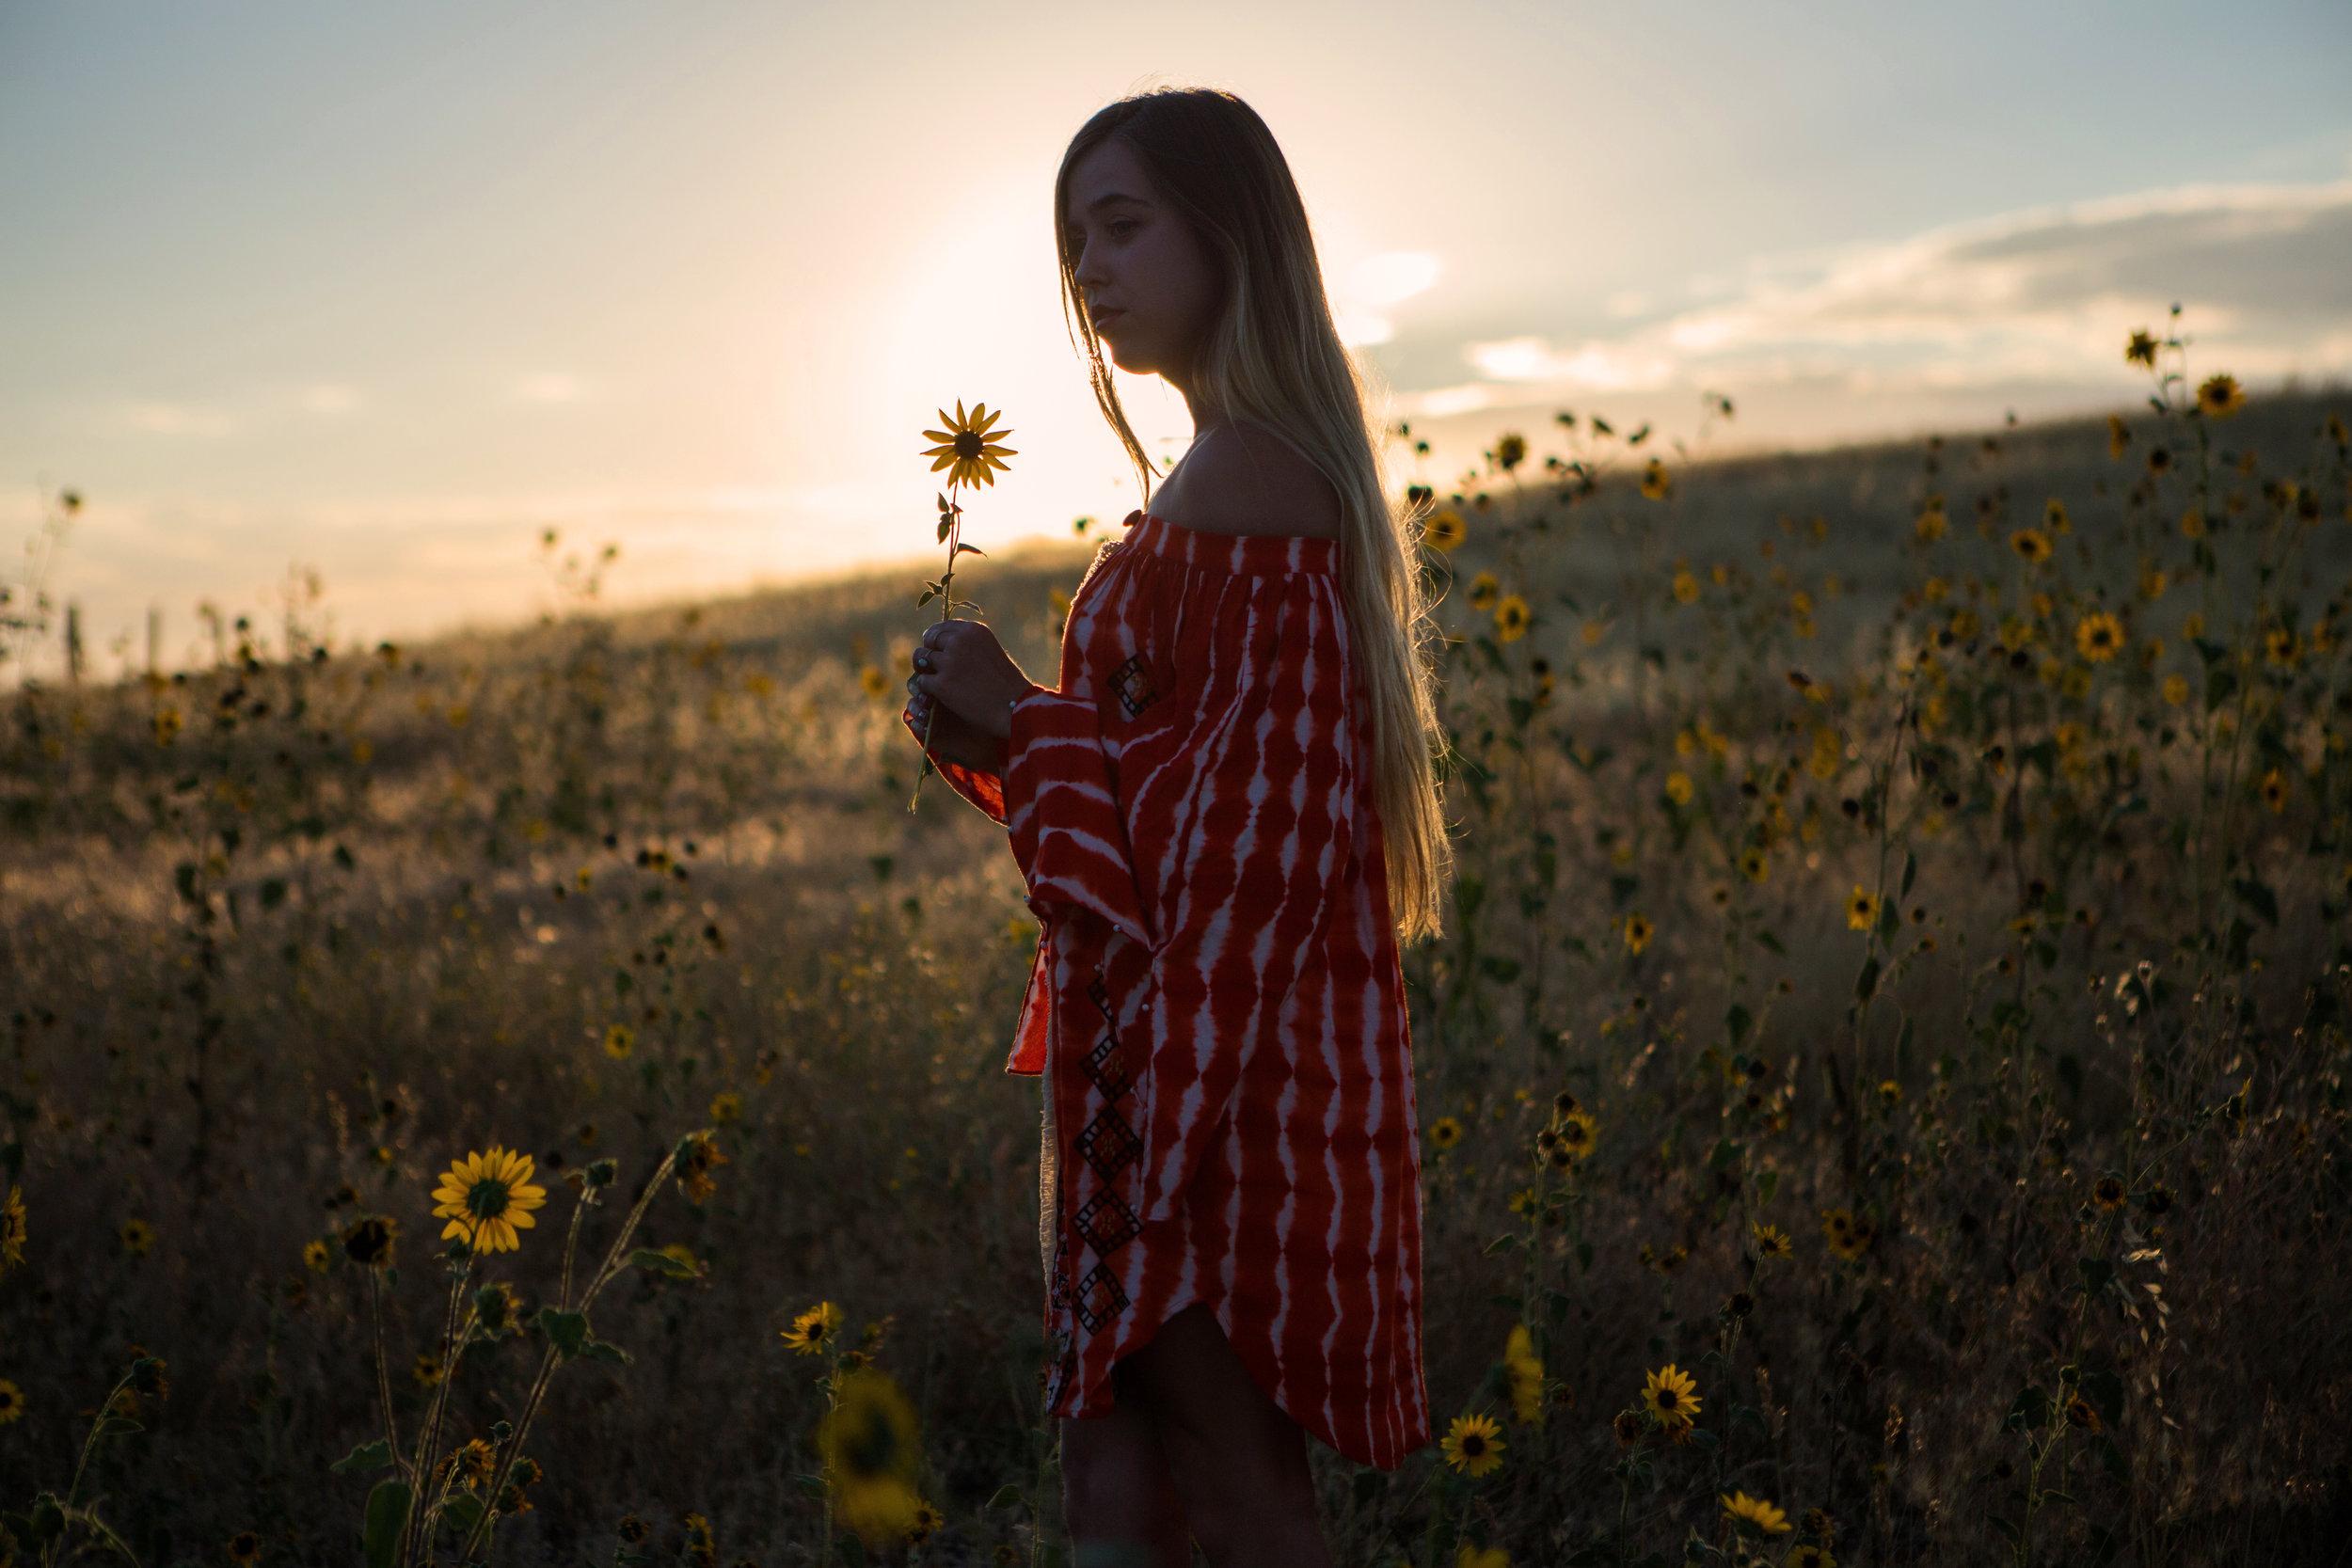 astrobandit_hemantandnandita_sunflowers_8.jpg